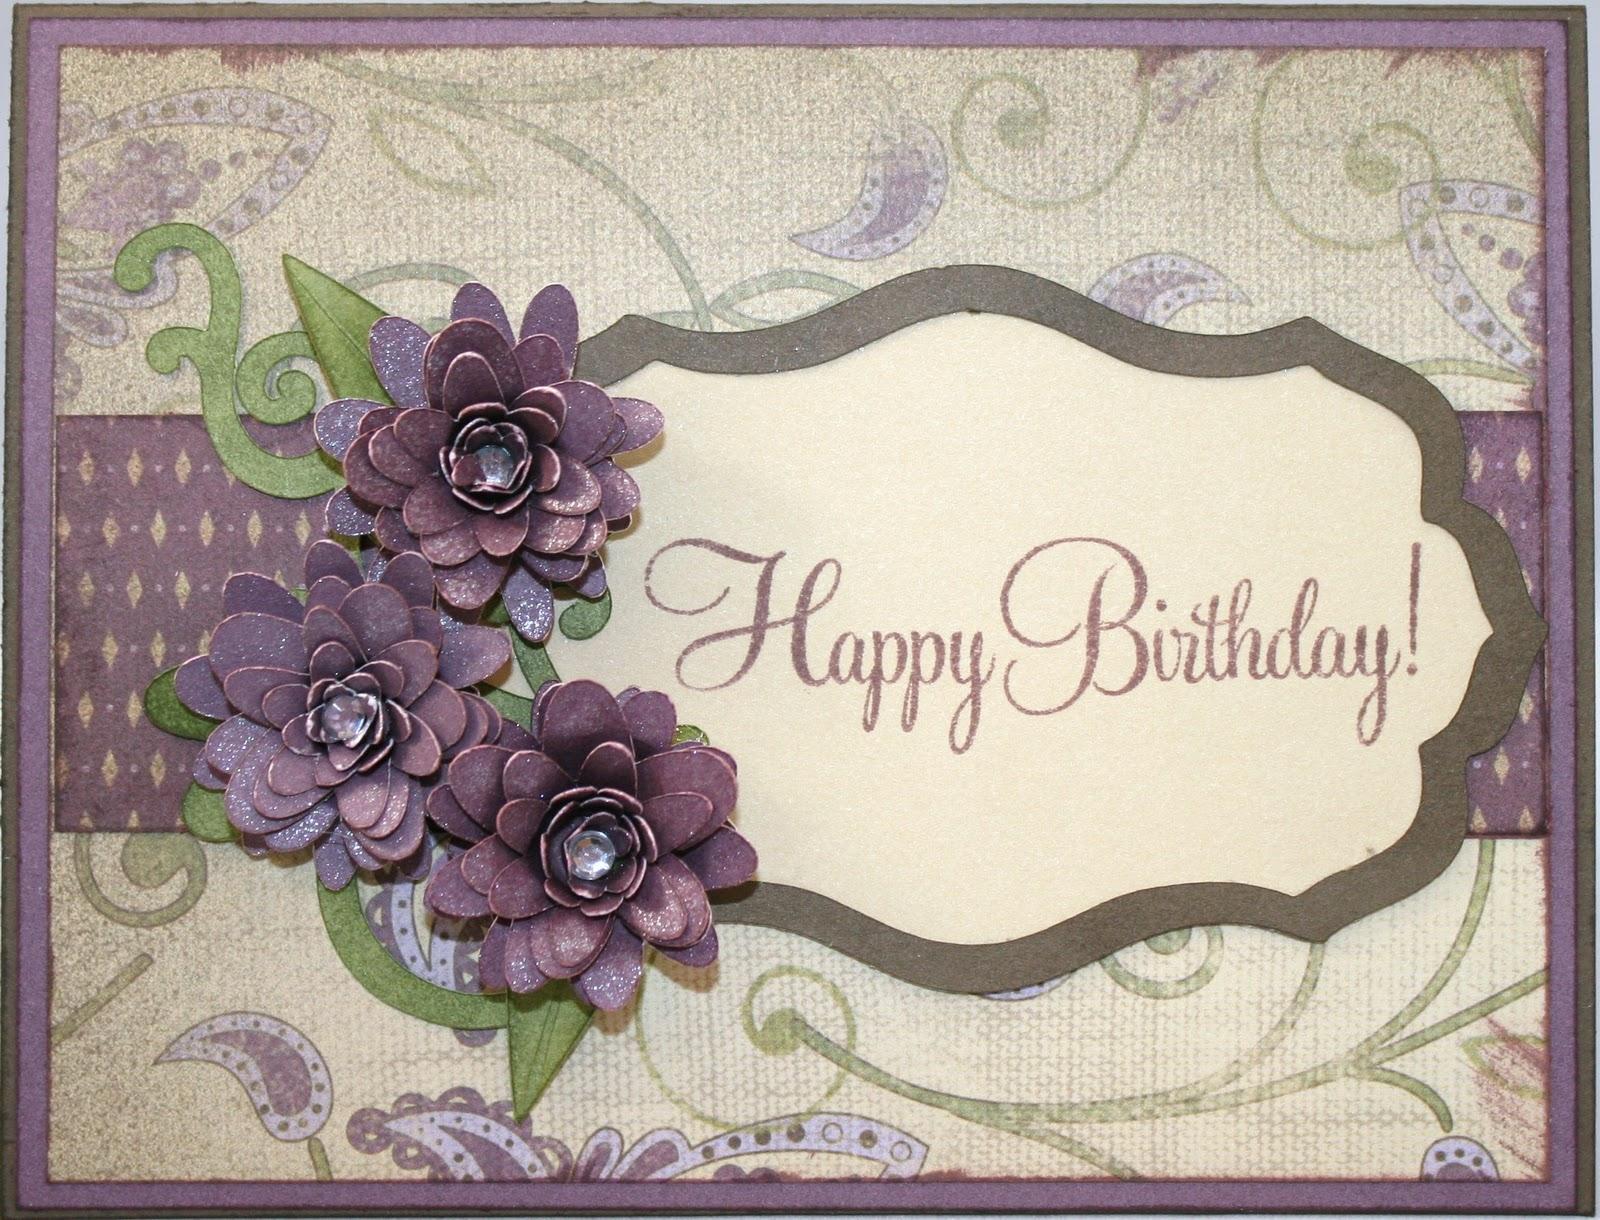 Scrapbook ideas using cricut - Birthday Card Using Cricut Ole Cartridge Crafty Ideas Pinterest 624x493 Heartfelt